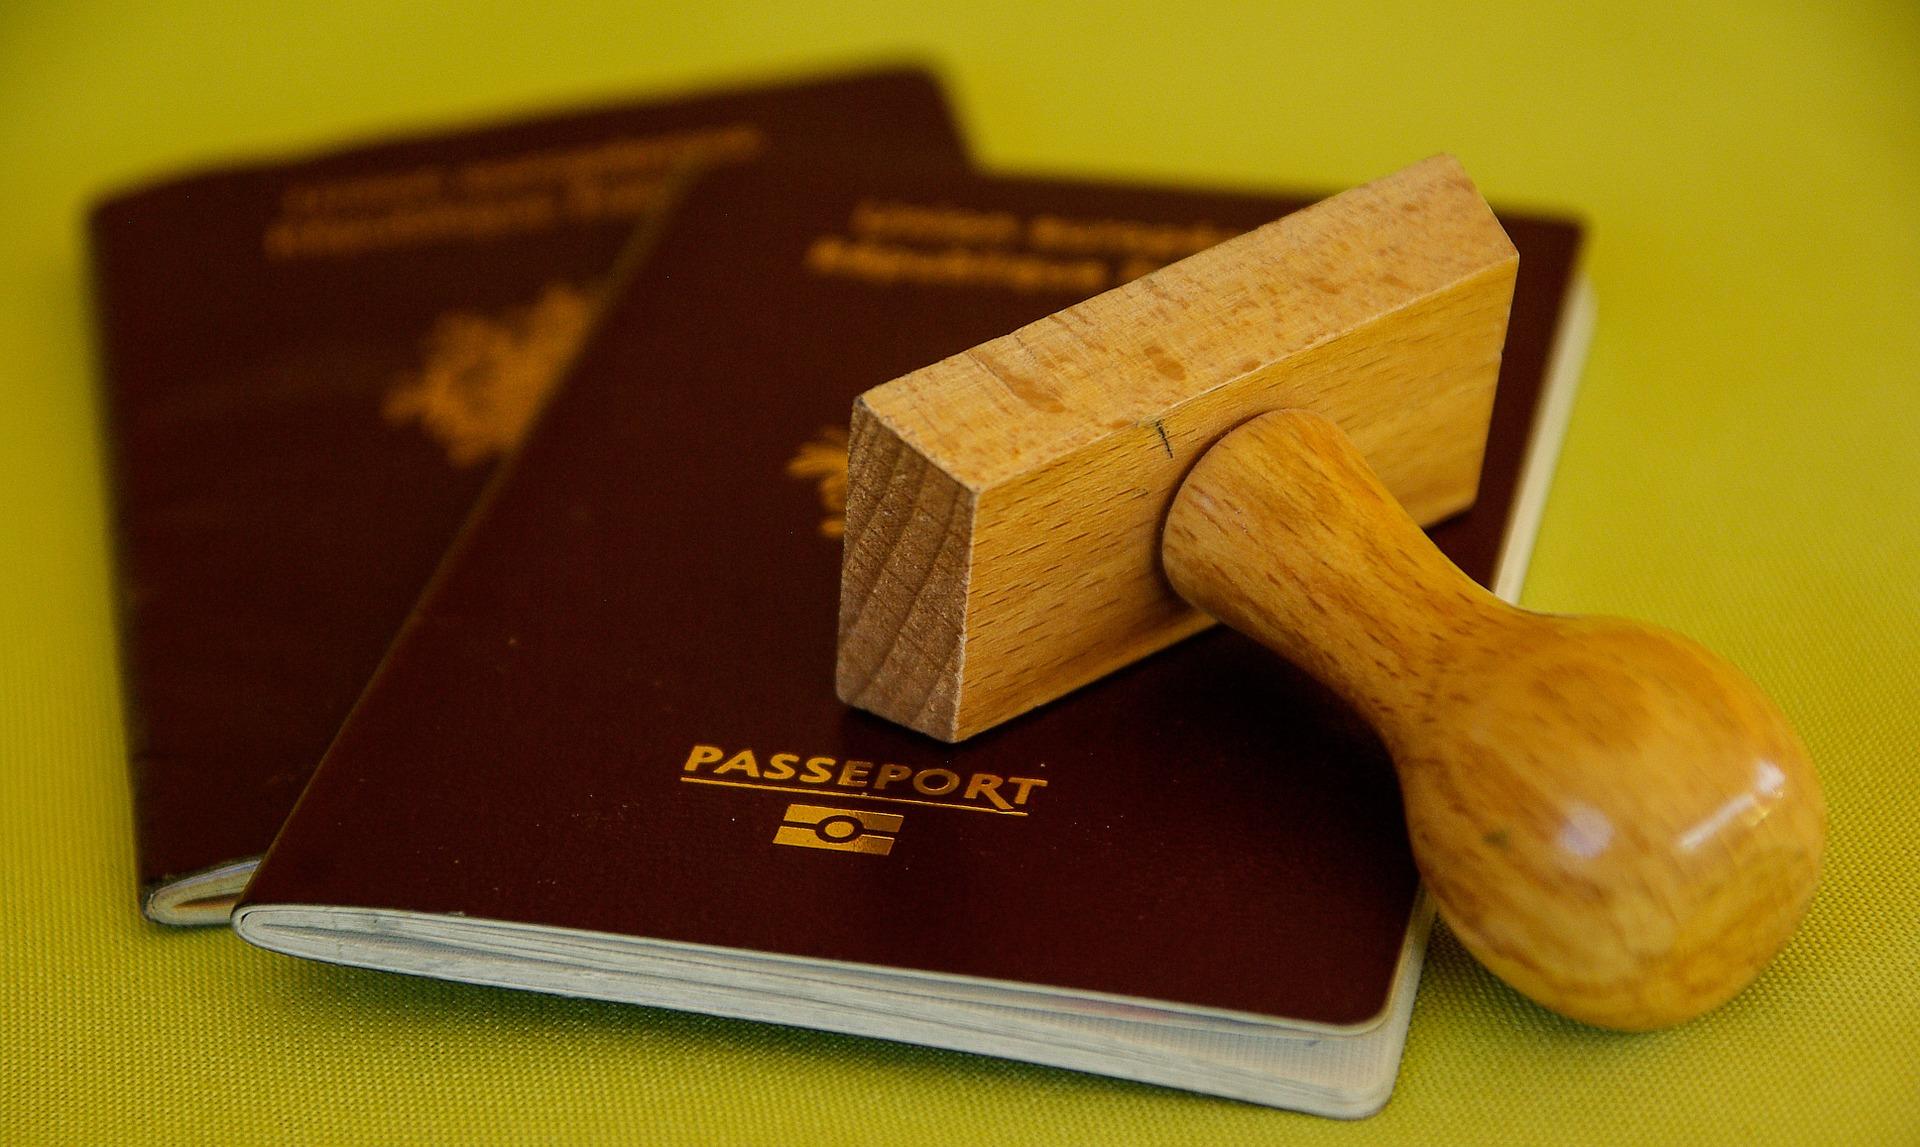 You are currently viewing רשימת שמות המשפחה הזכאים לדרכון פורטוגלי: האם אתם זכאים?